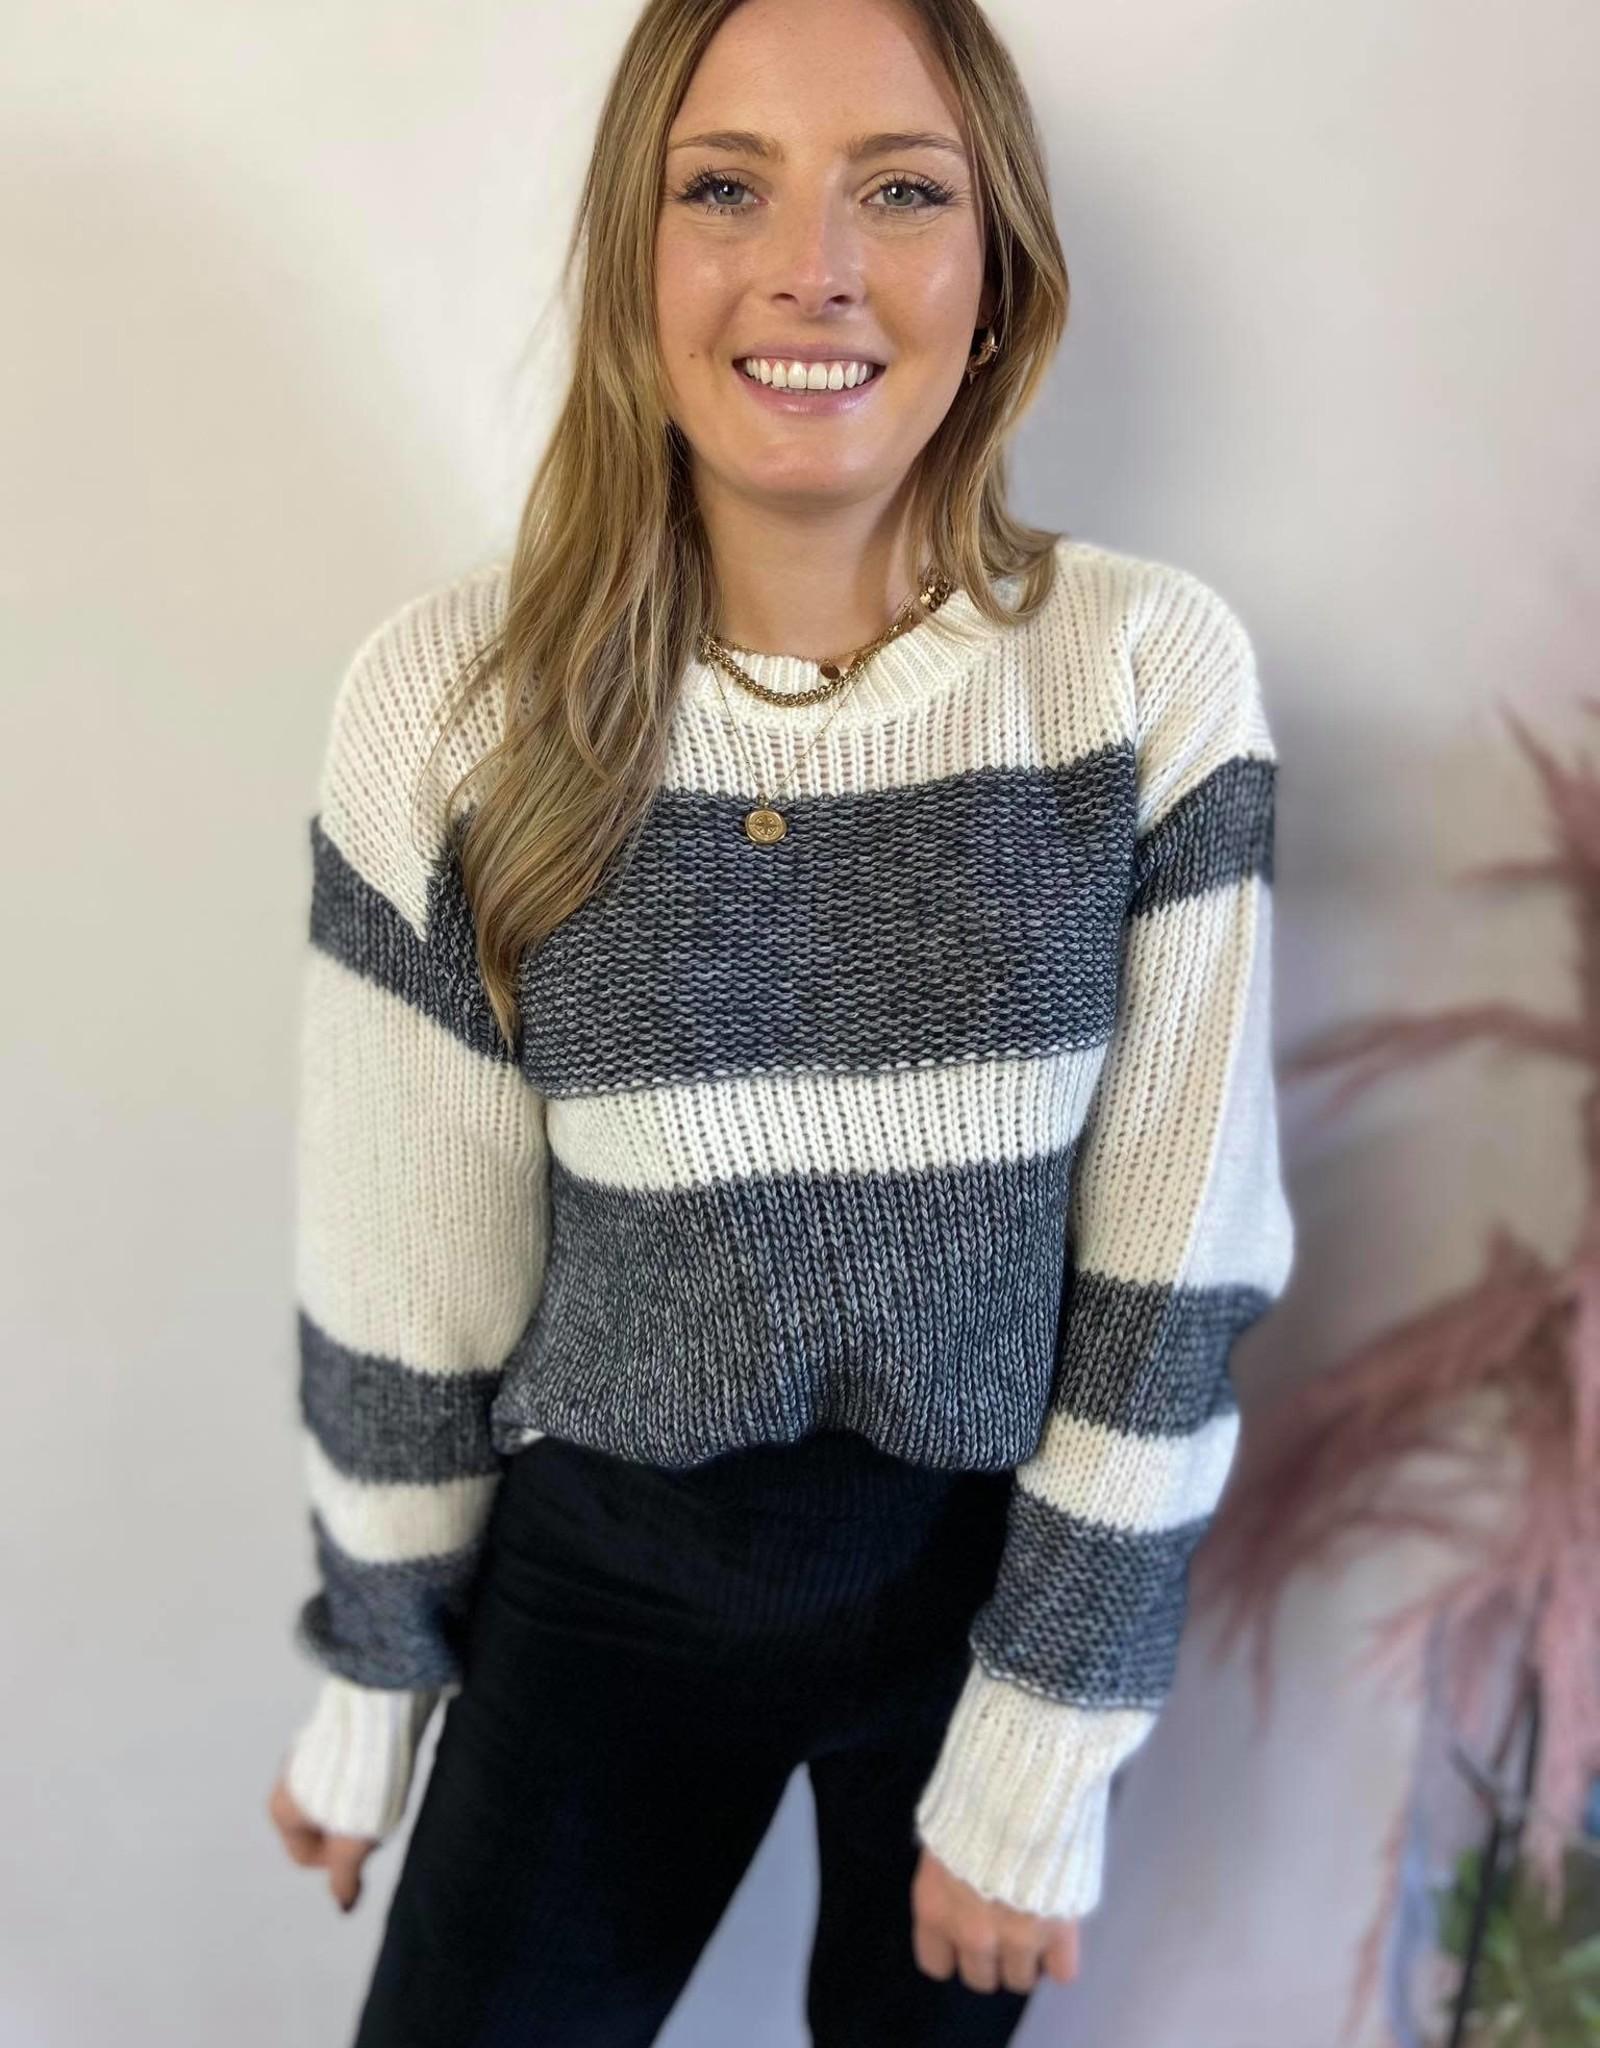 Nora striped knit black